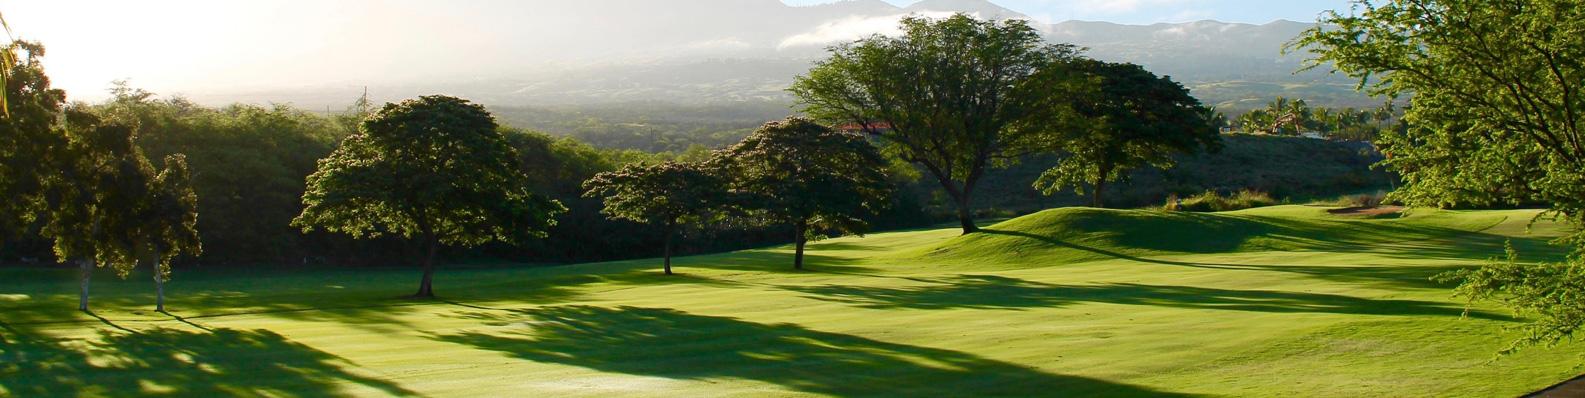 Benefits a Golf Tournament Sponsorship Provides to Business